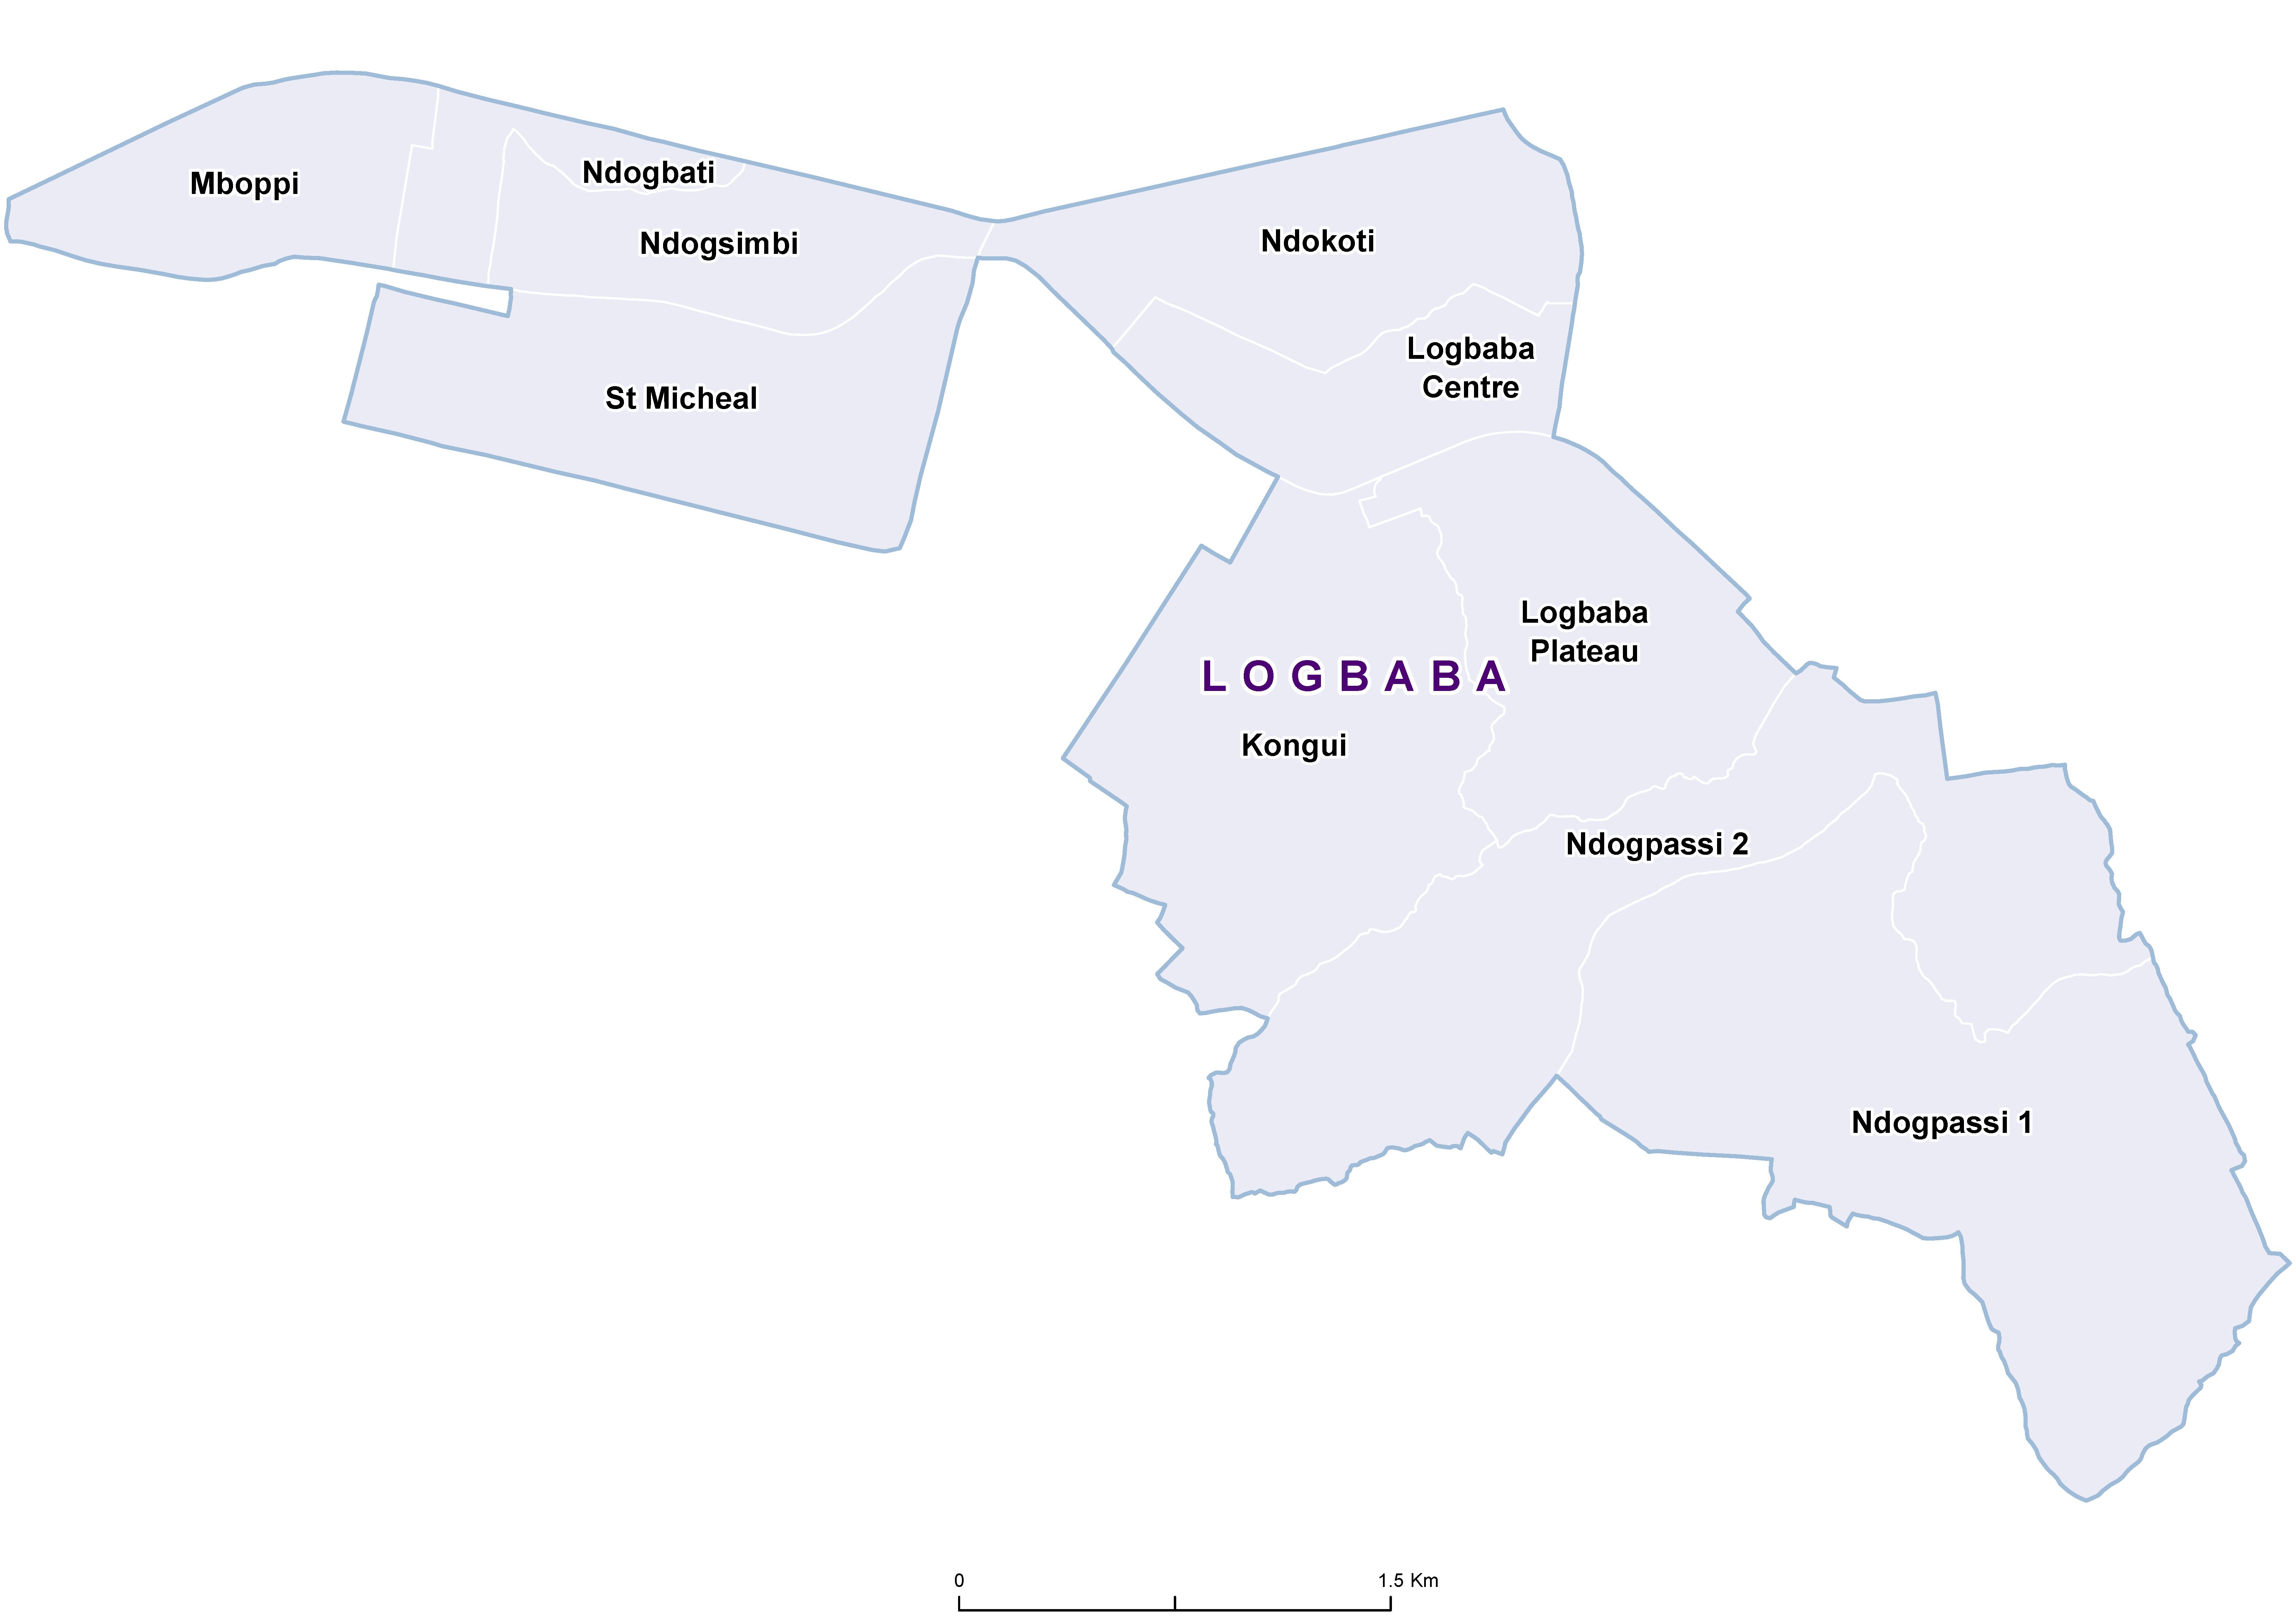 Logbaba STH 19850001